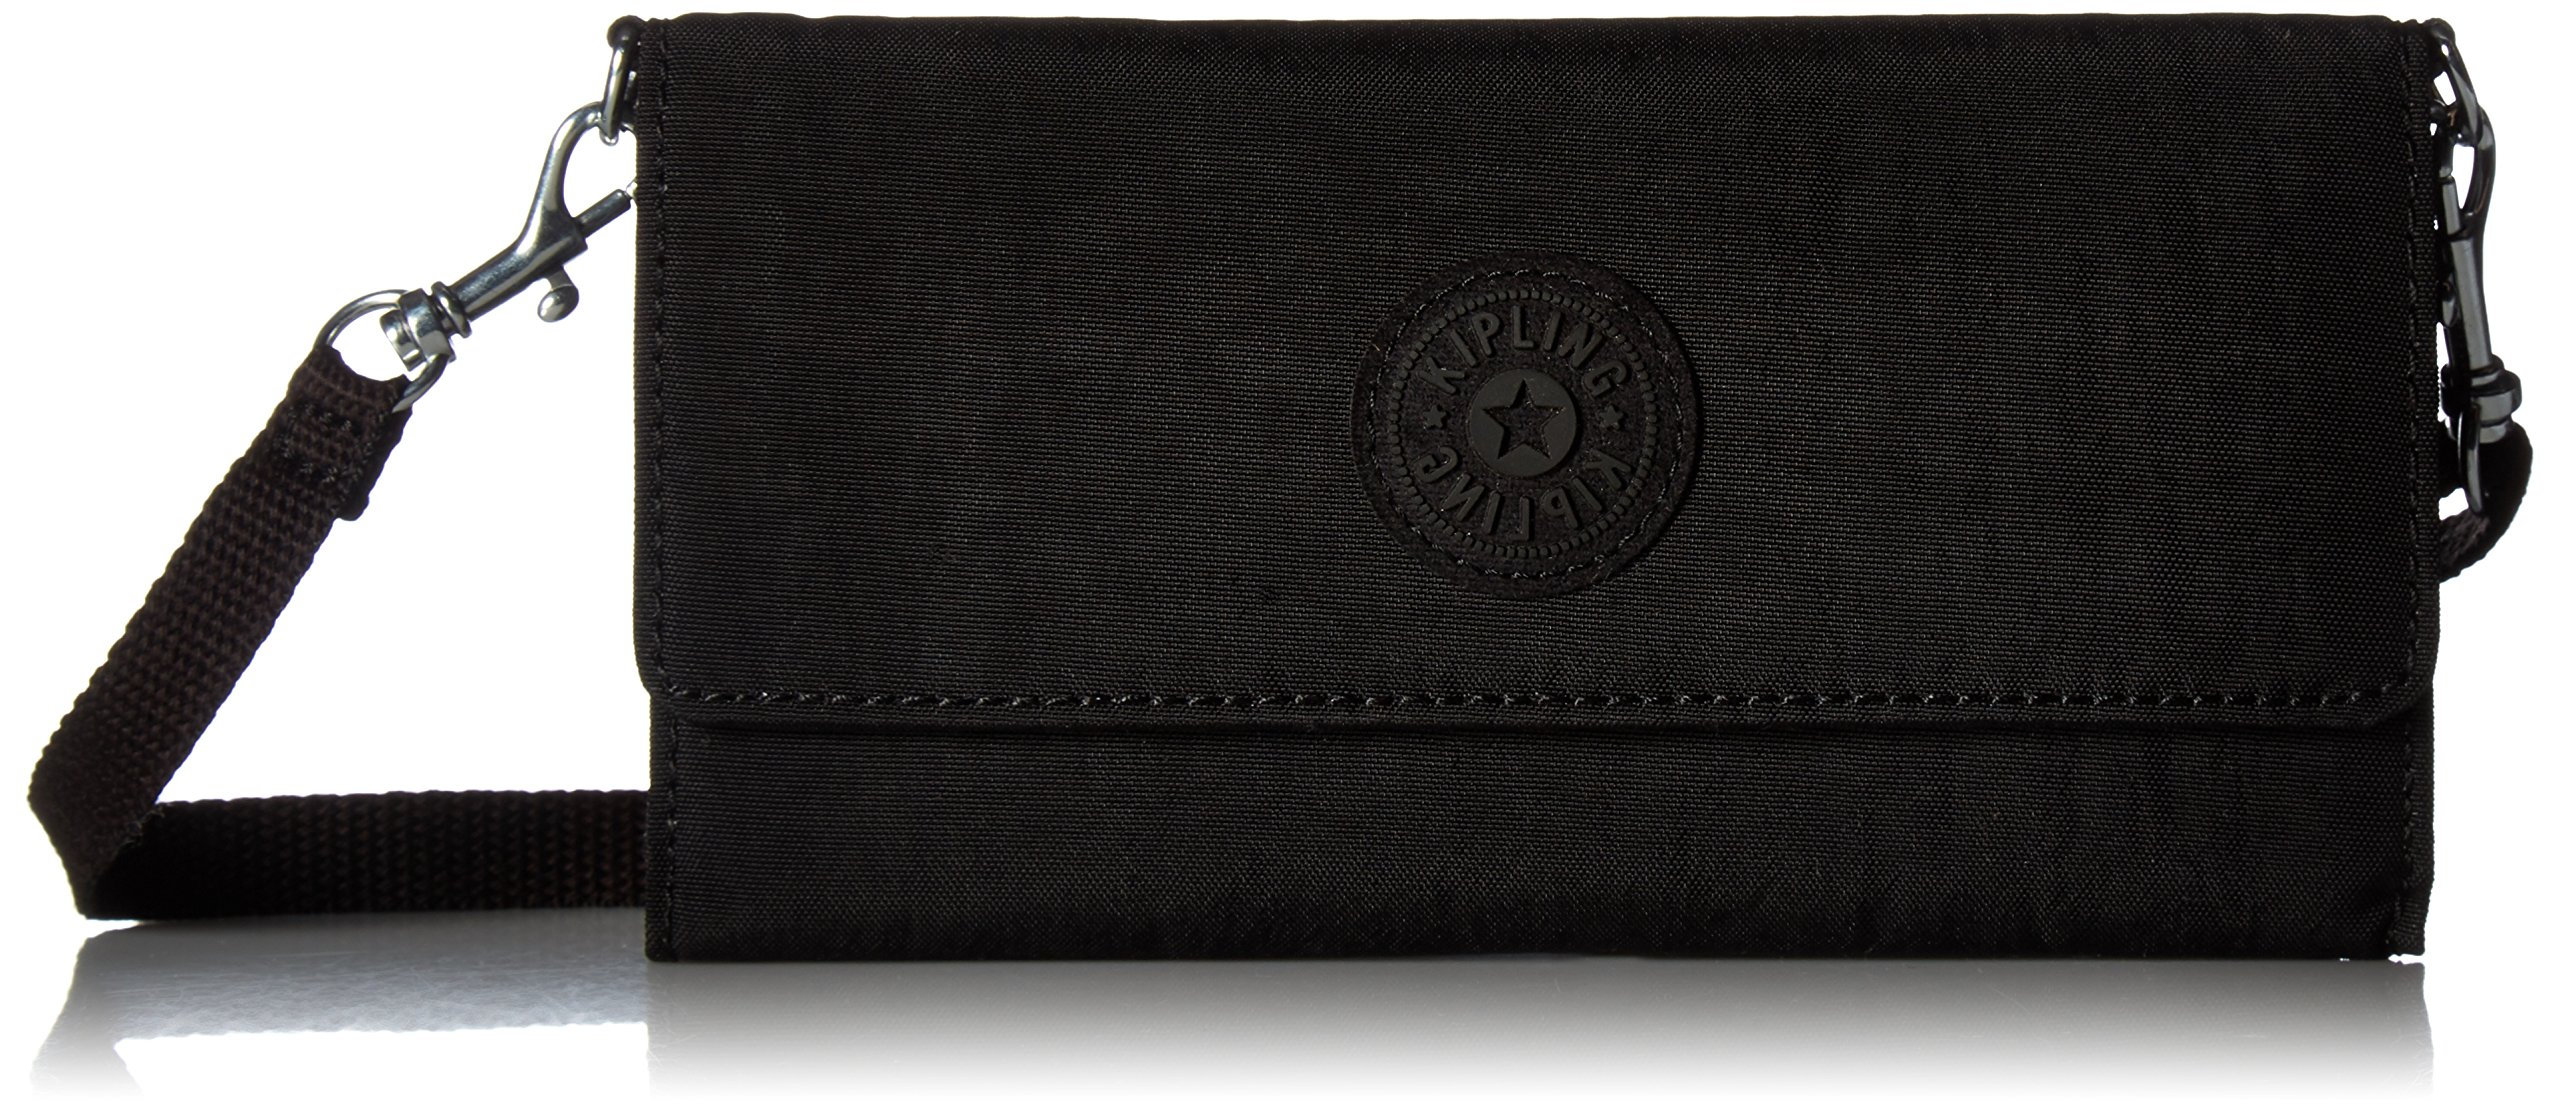 Kipling Zuma Convertible Wallet Crossbody, BLACK, One Size by Kipling